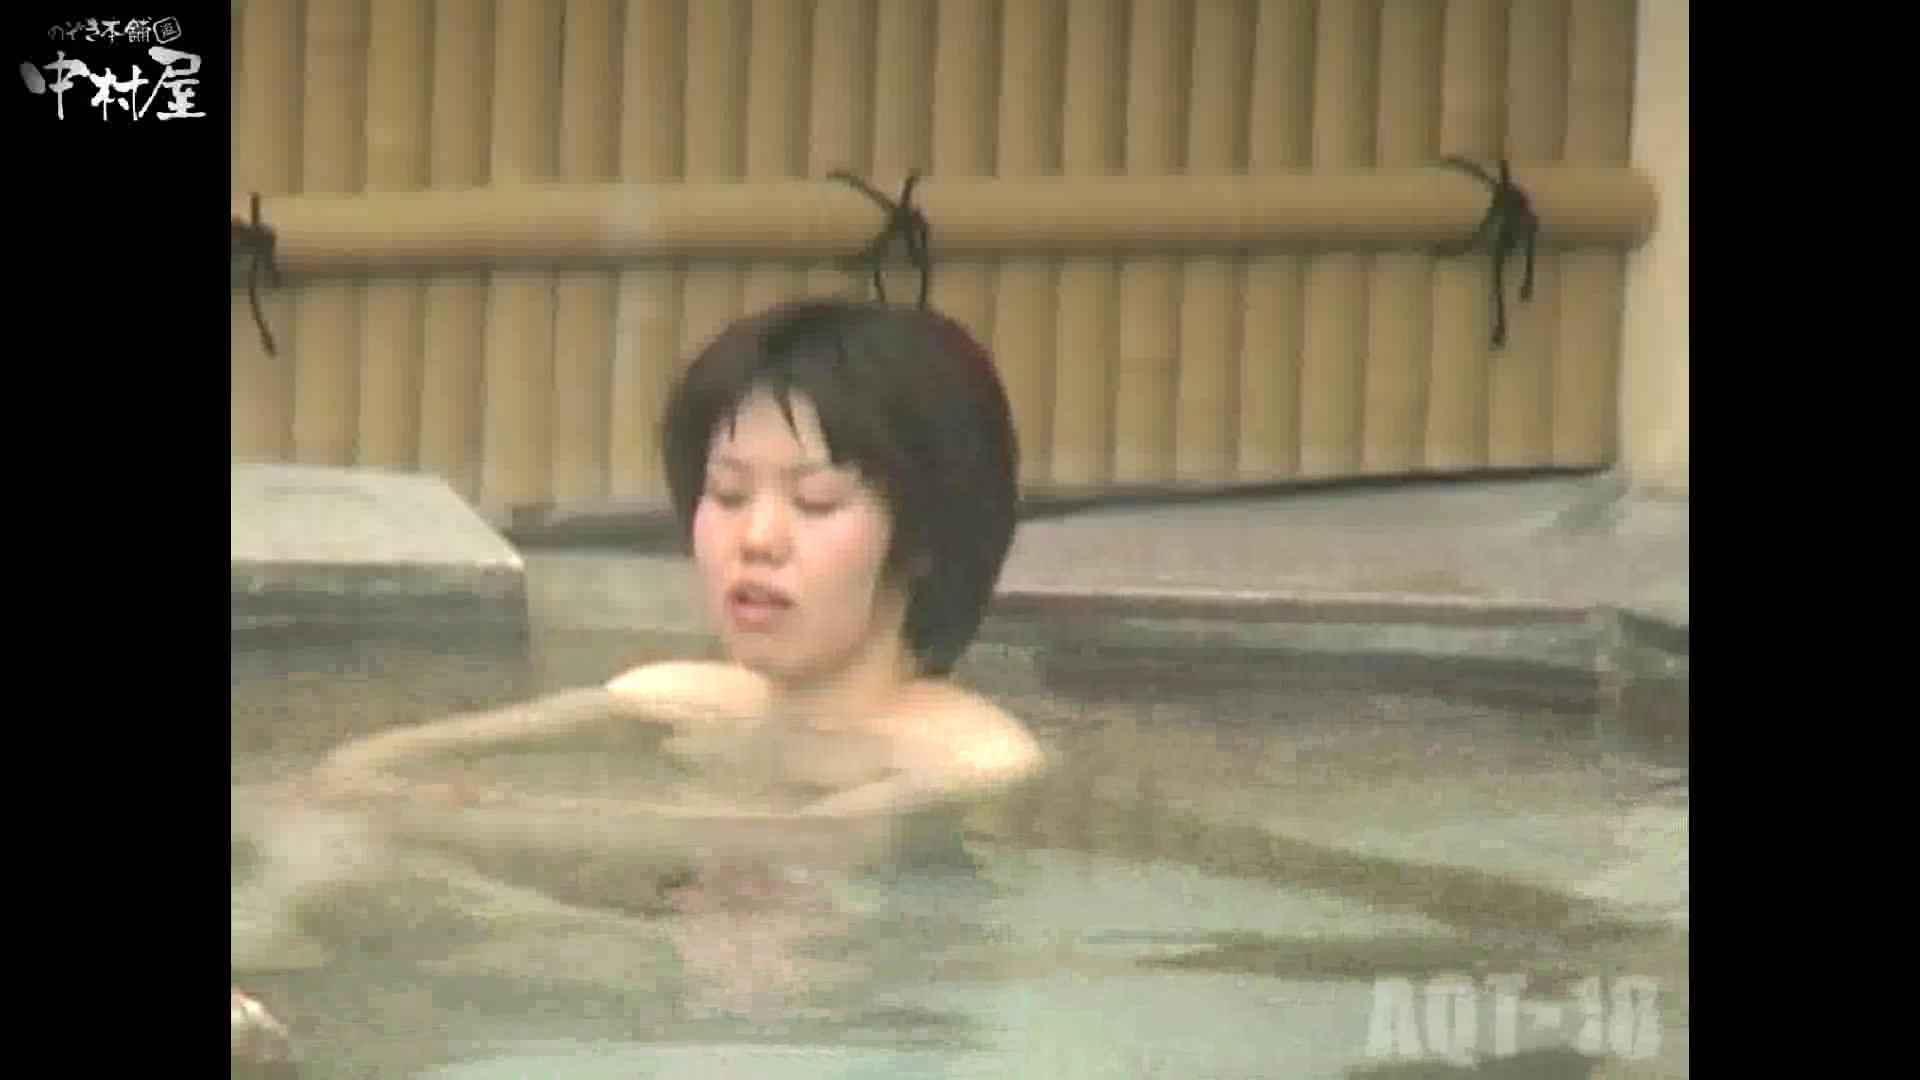 Aquaな露天風呂Vol.882潜入盗撮露天風呂十八判湯 其の七 盗撮 AV動画キャプチャ 84画像 6